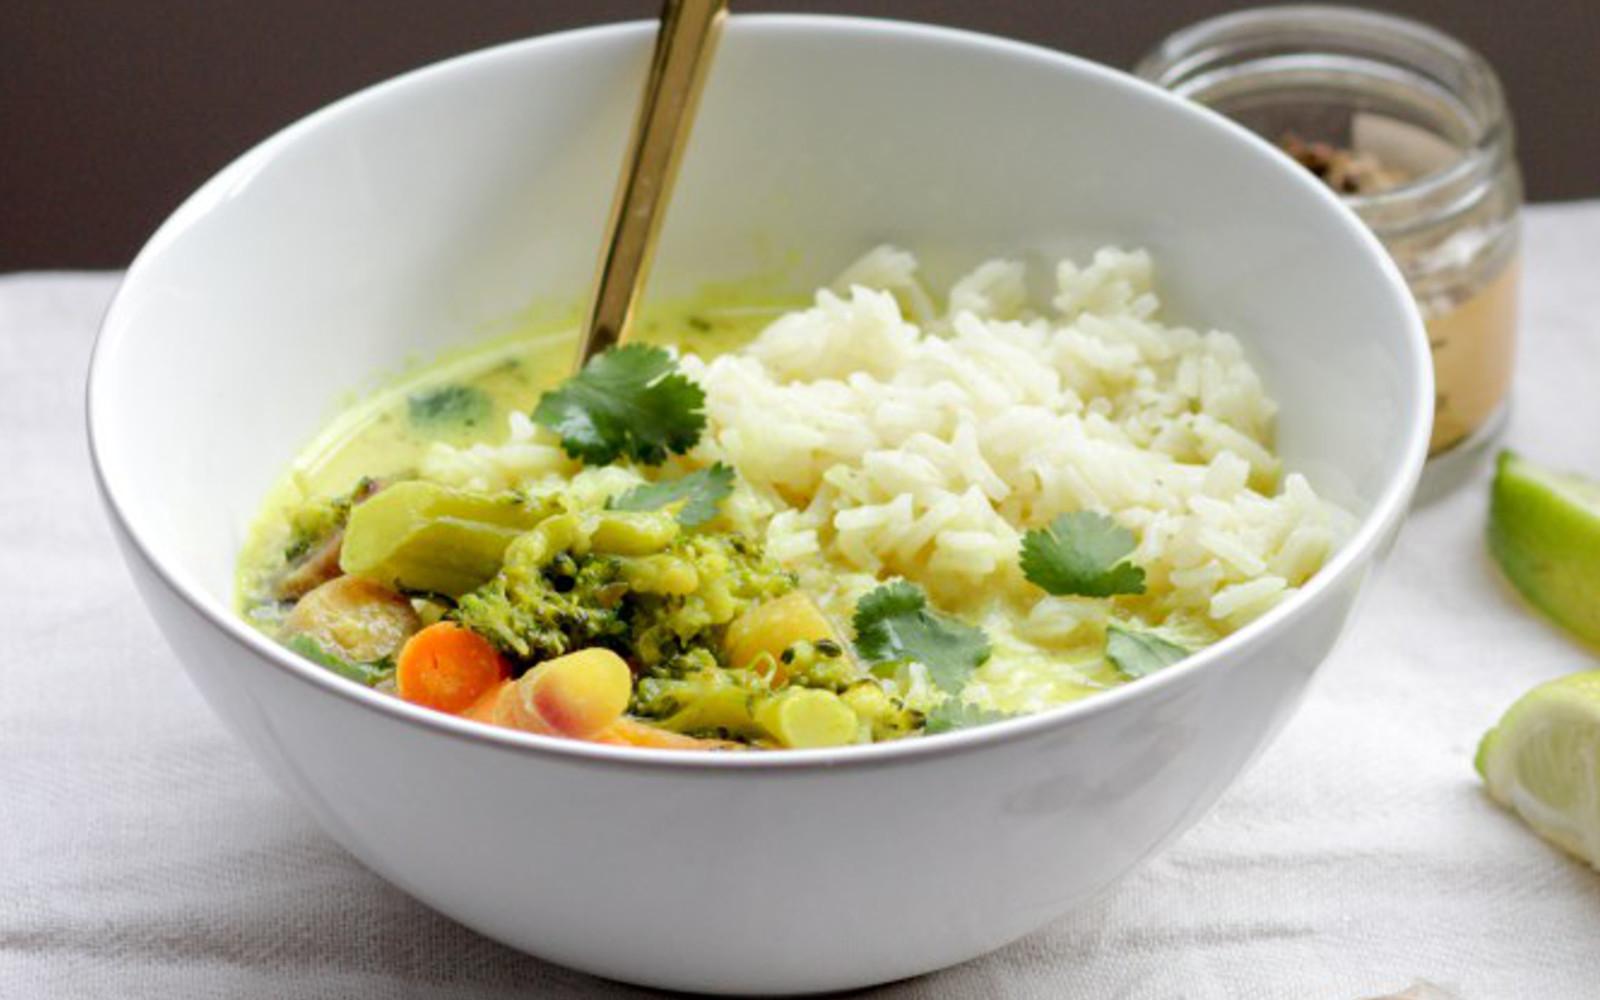 Turmeric Coconut Milk Vegetable Bowl